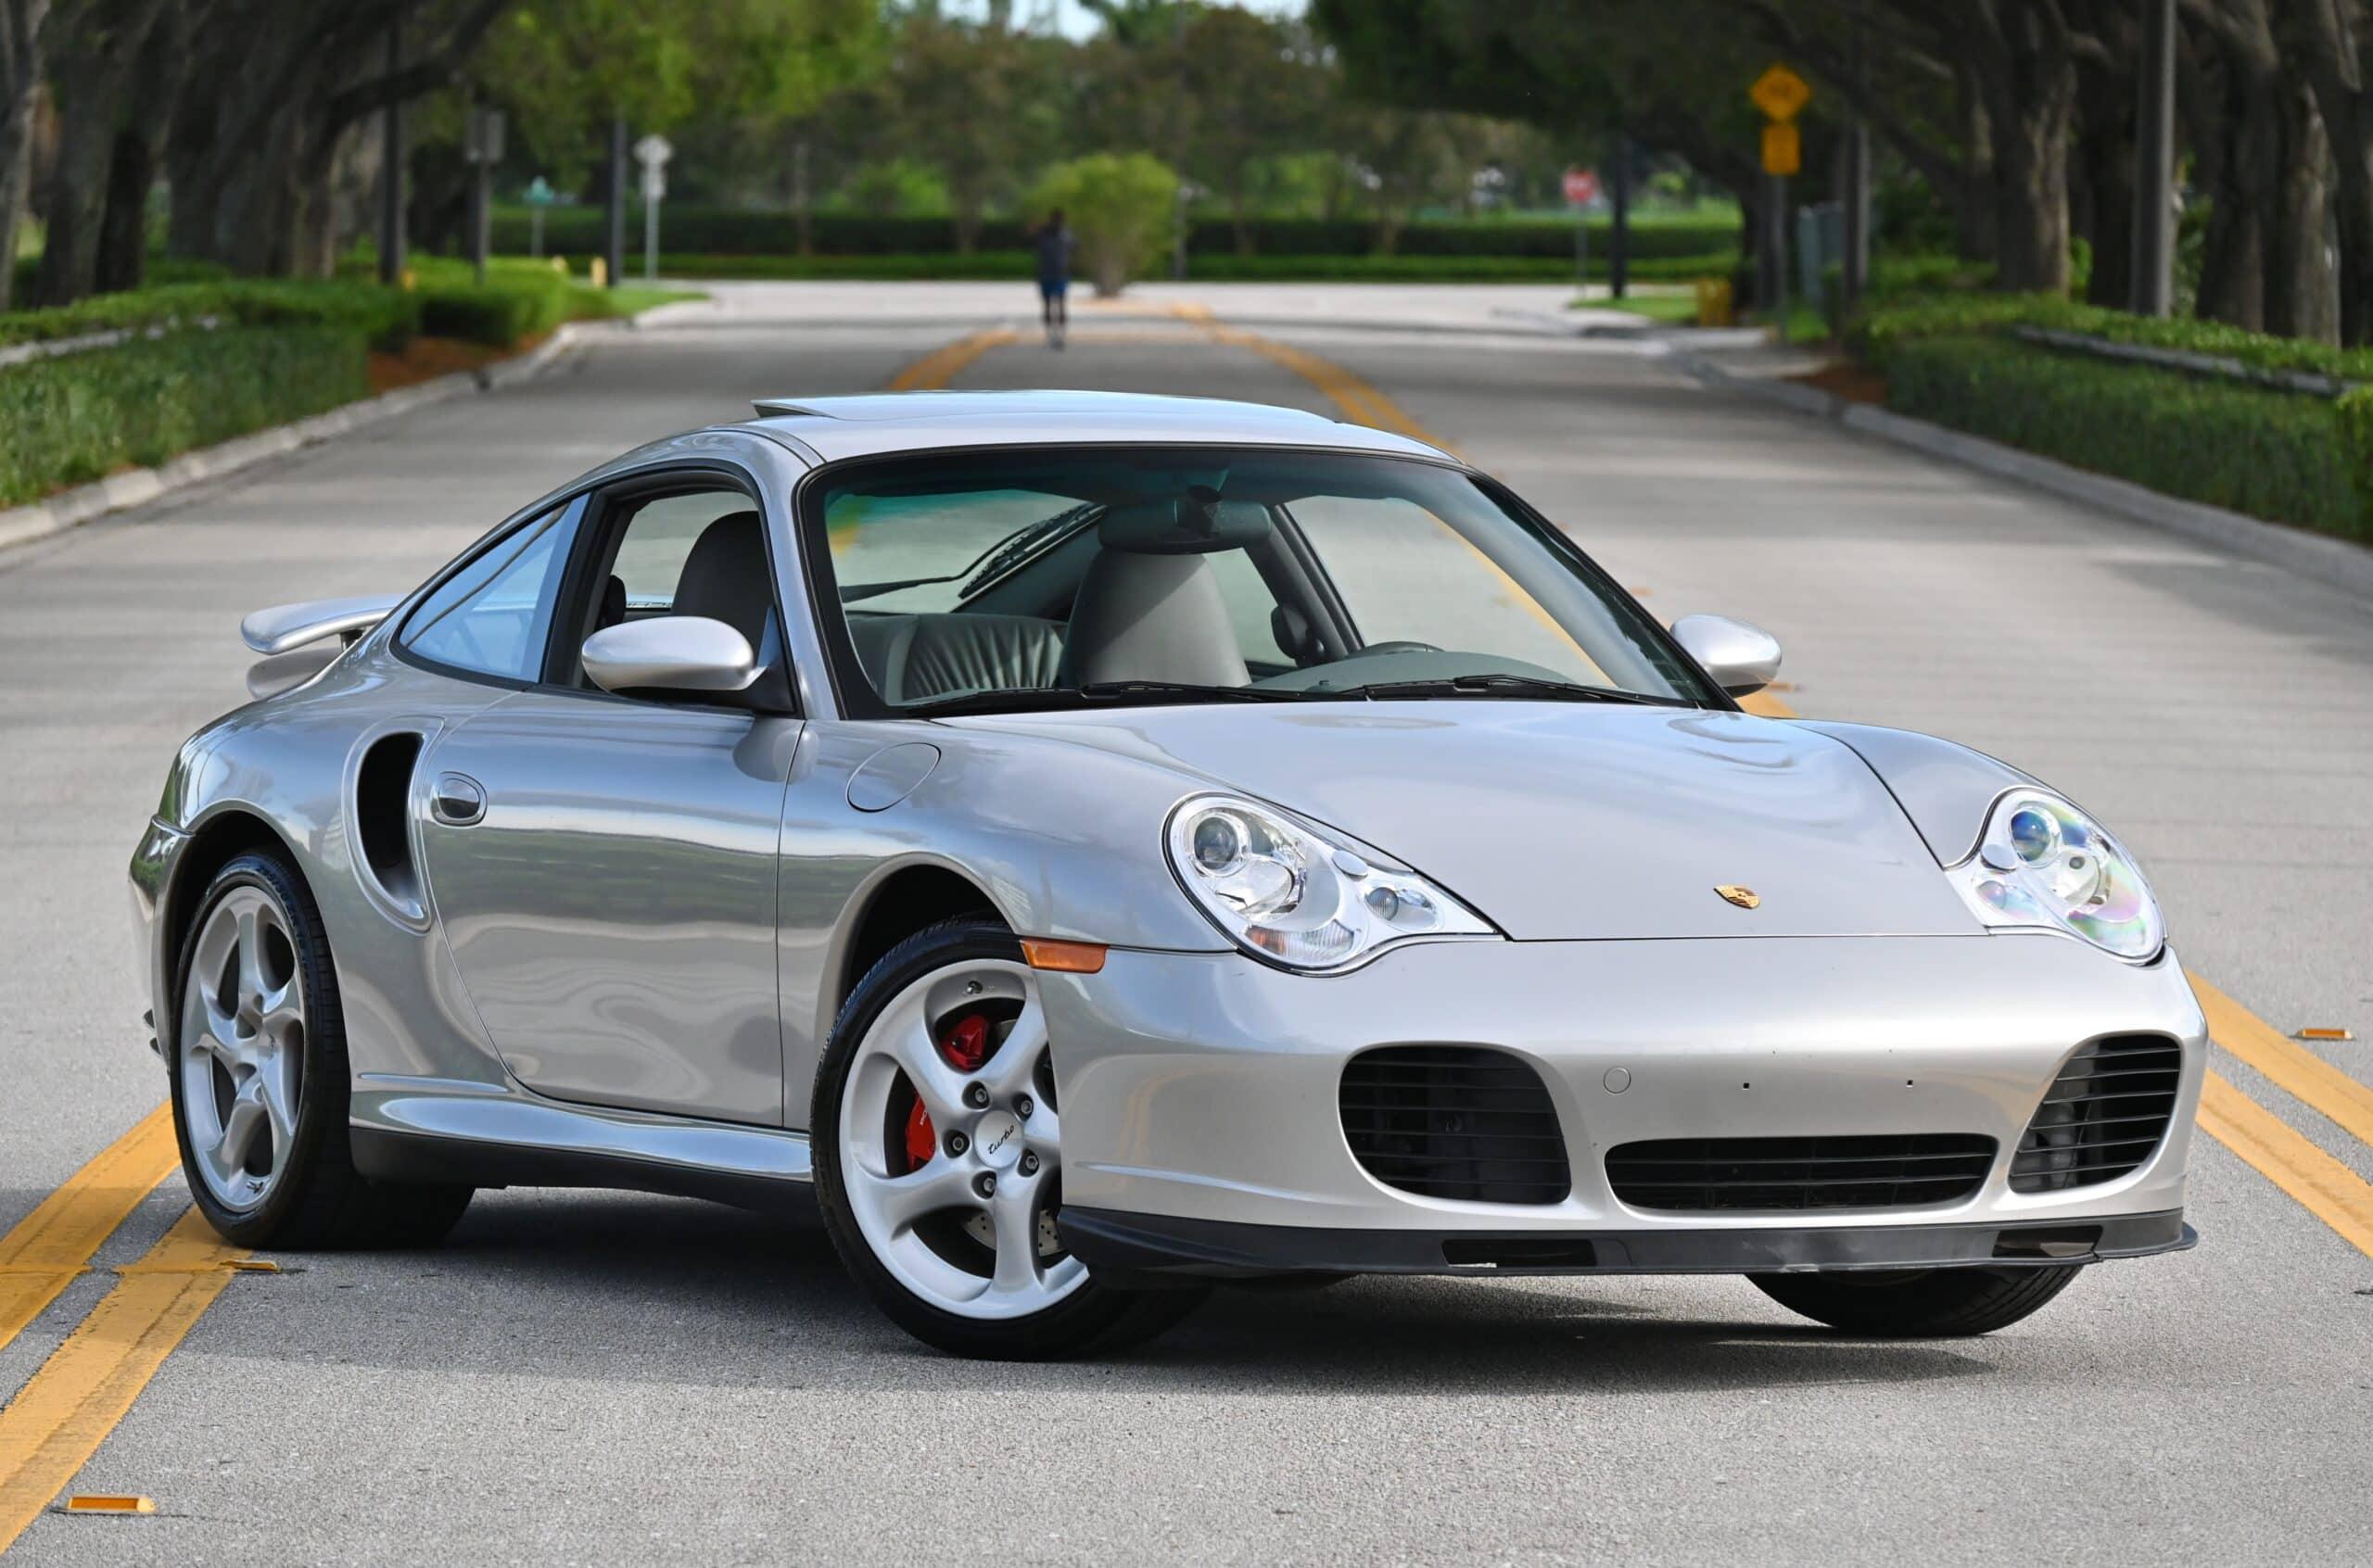 2002 Porsche 911 Turbo 996 1 Owner – 13k Actual Miles – Original Title – 100% Stock Unmodified – Texas Car